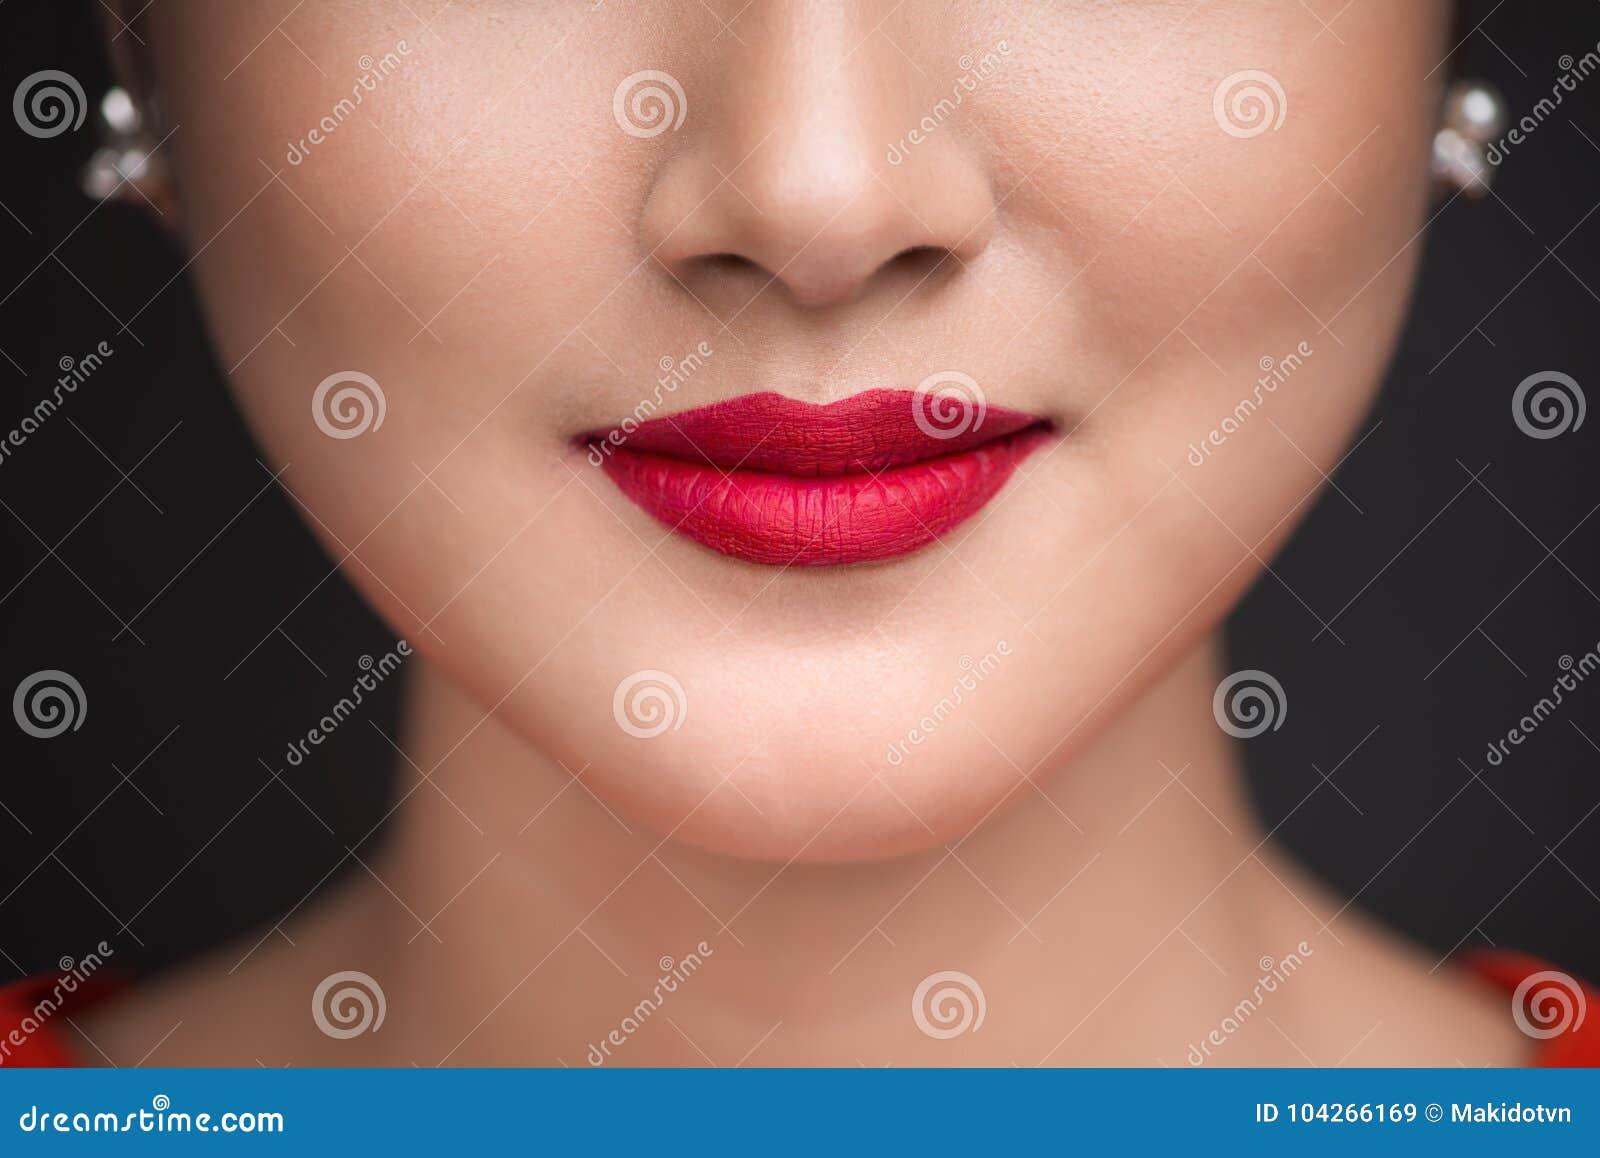 Beauvoir 关闭美丽的妇女嘴唇看法有红色暗淡嘴唇的